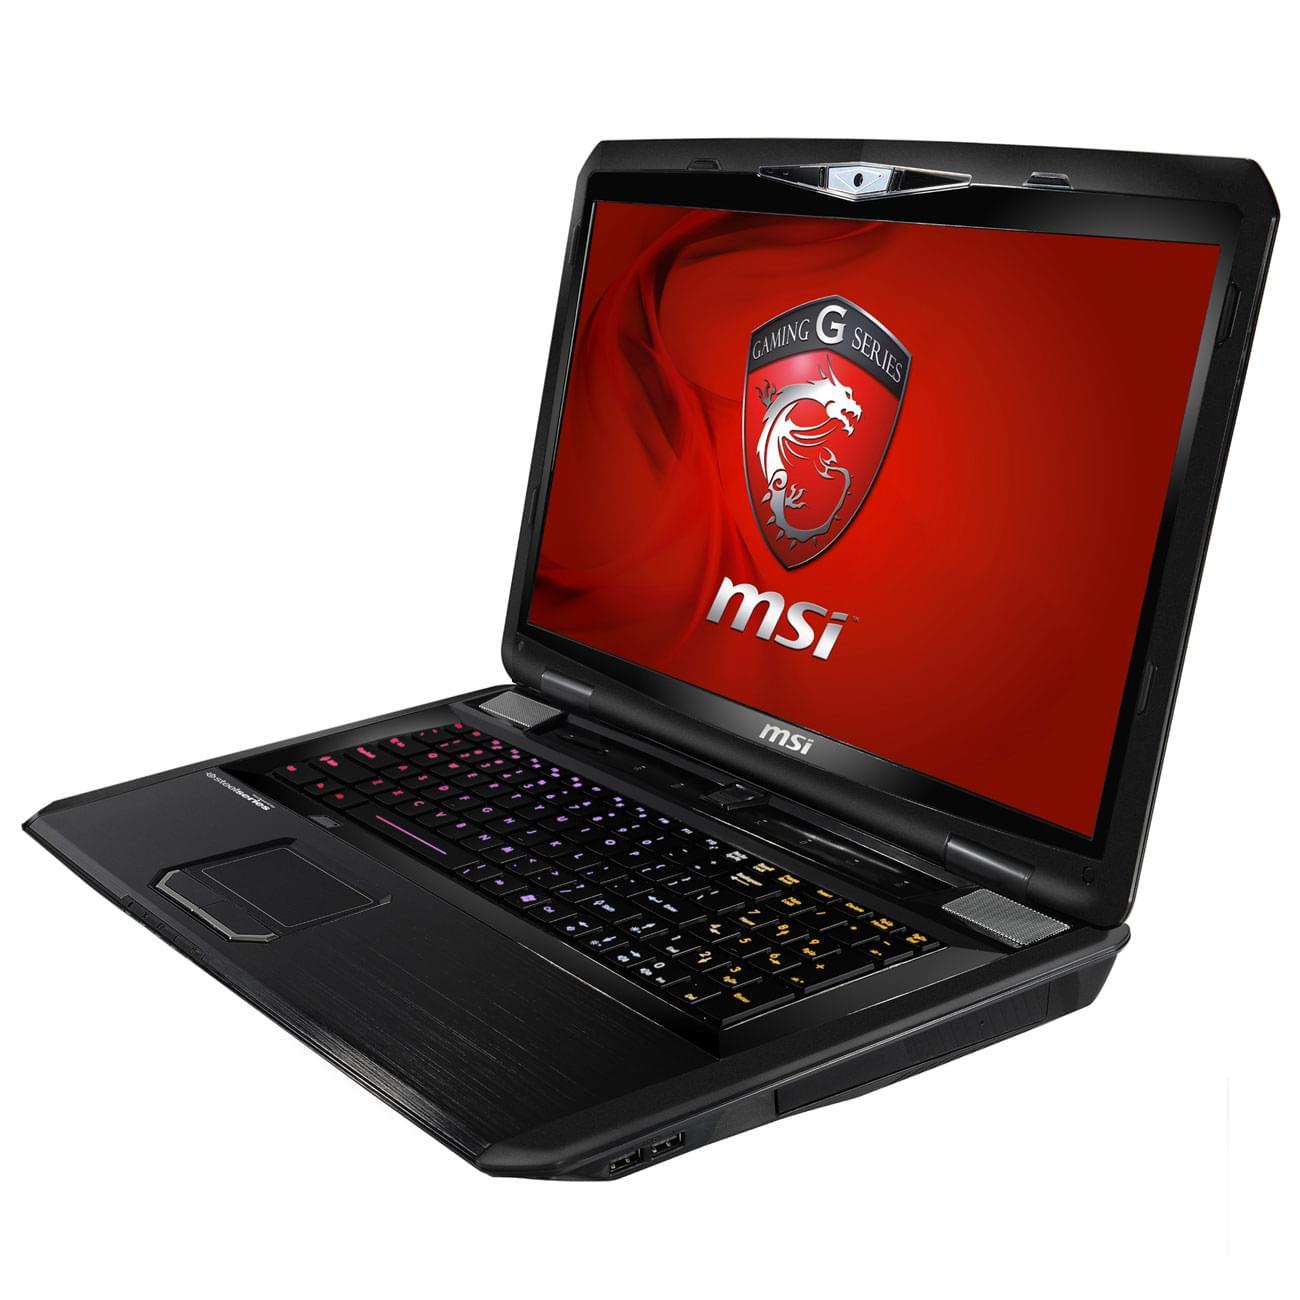 MSI GT70 0NE-473 (GT70 0NE-473) - Achat / Vente PC Portable sur Cybertek.fr - 0